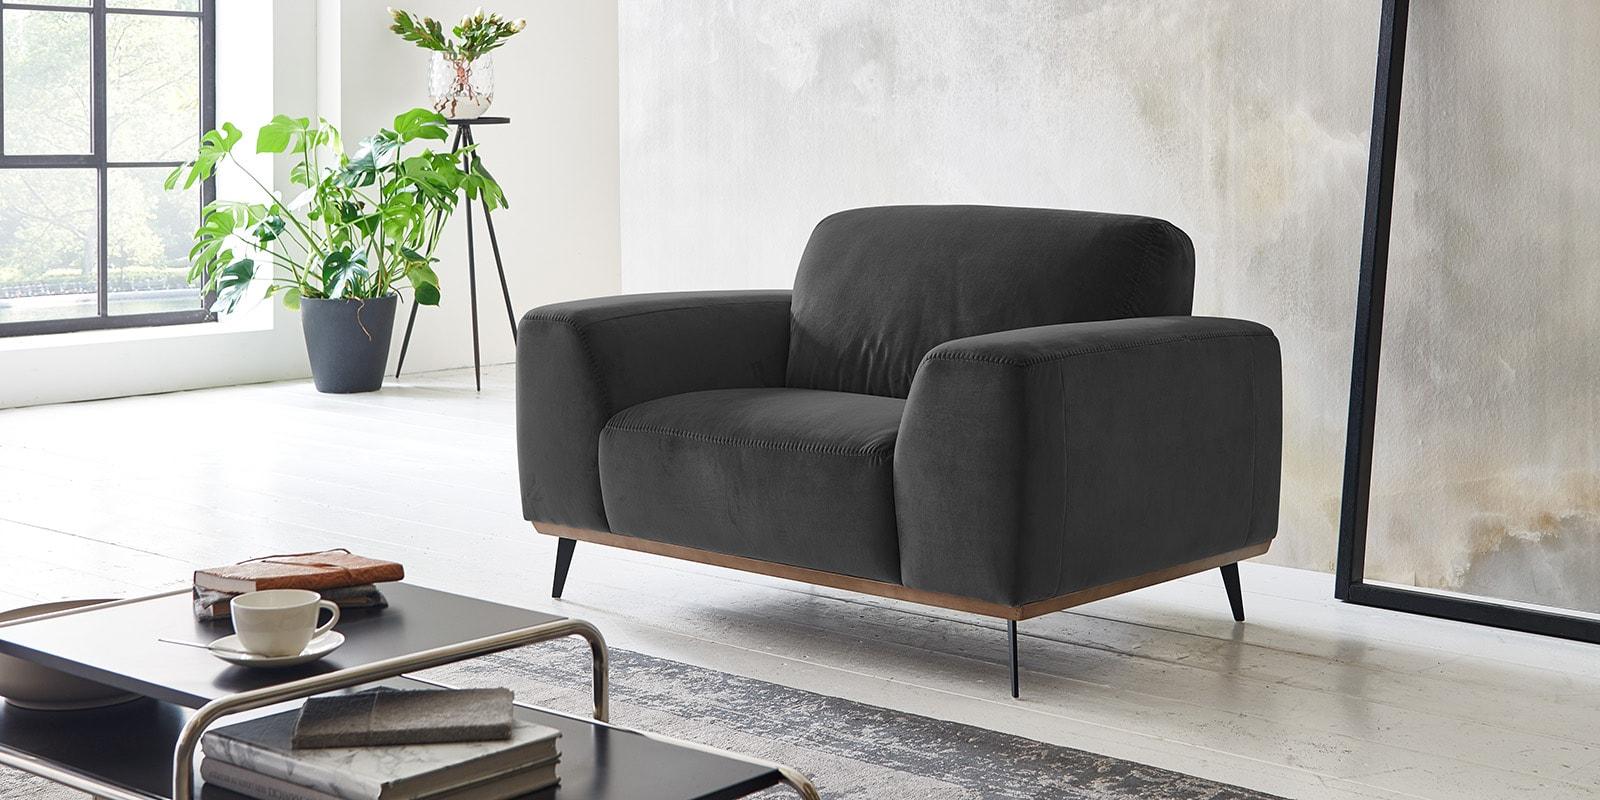 Moebella24 - 1-Sitzer - Sofa - Sessel - Barcelona - Samt - Anthrazit - Skandinavisches - Design - Punto - cavallo - Nähte